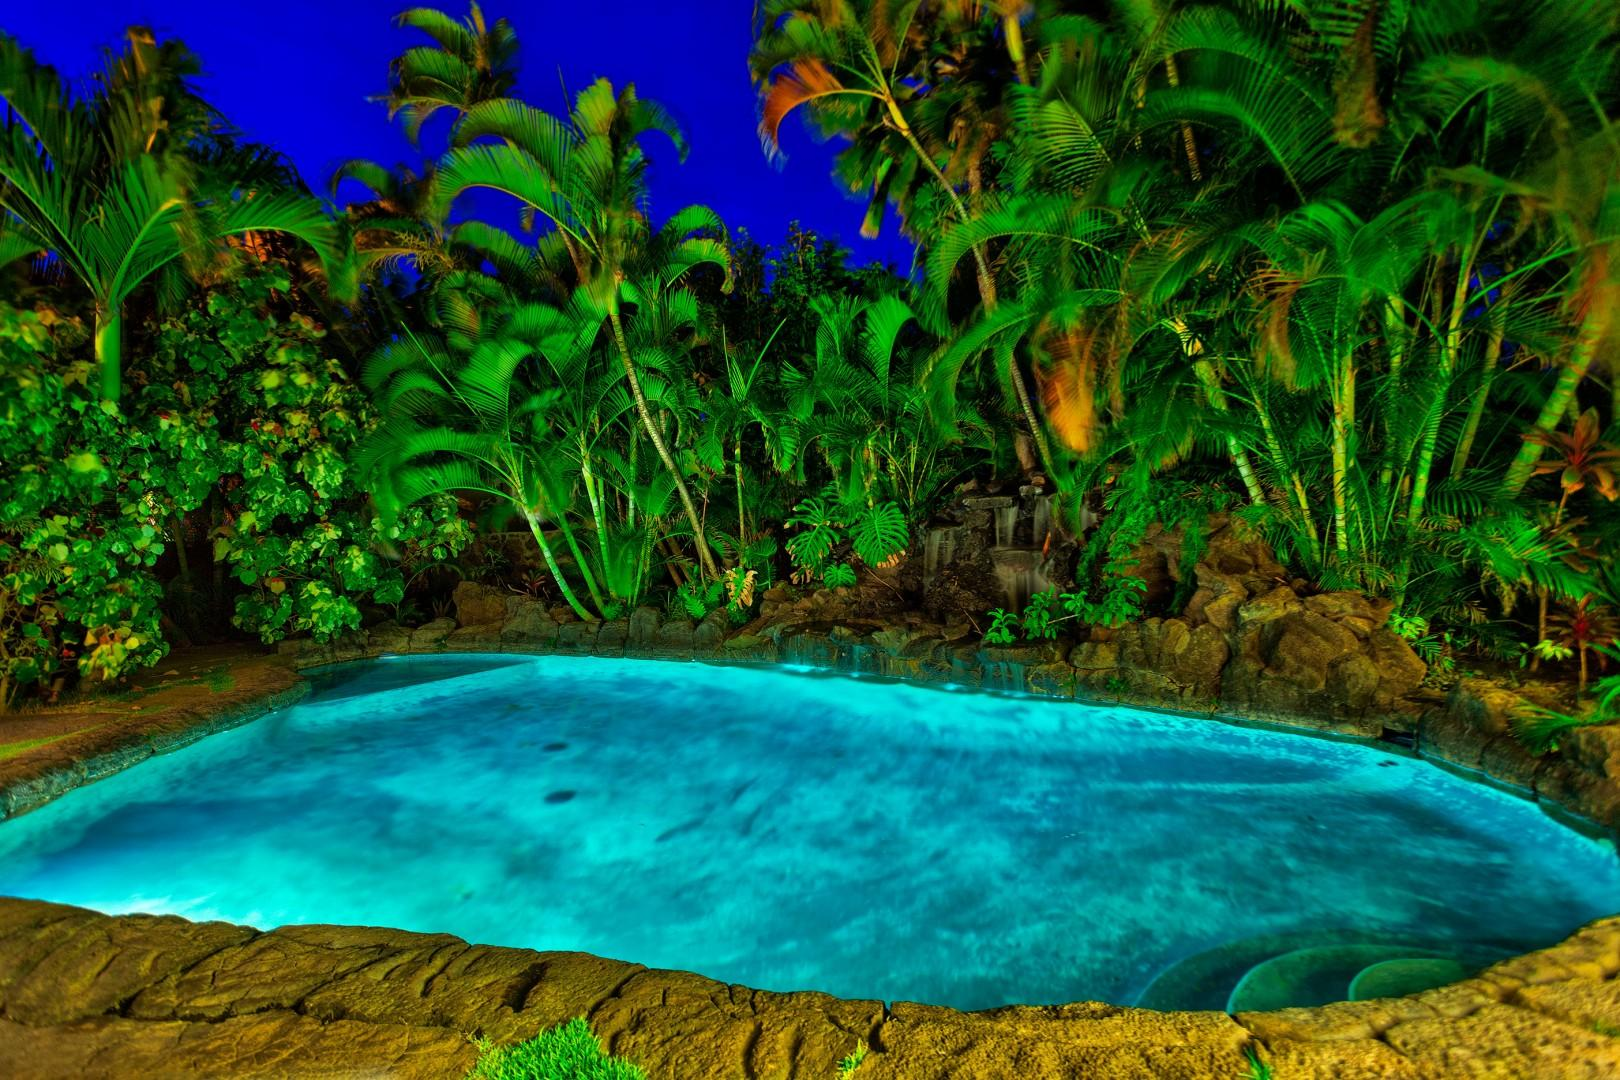 The beautiful tropical oasis, Maluhia.